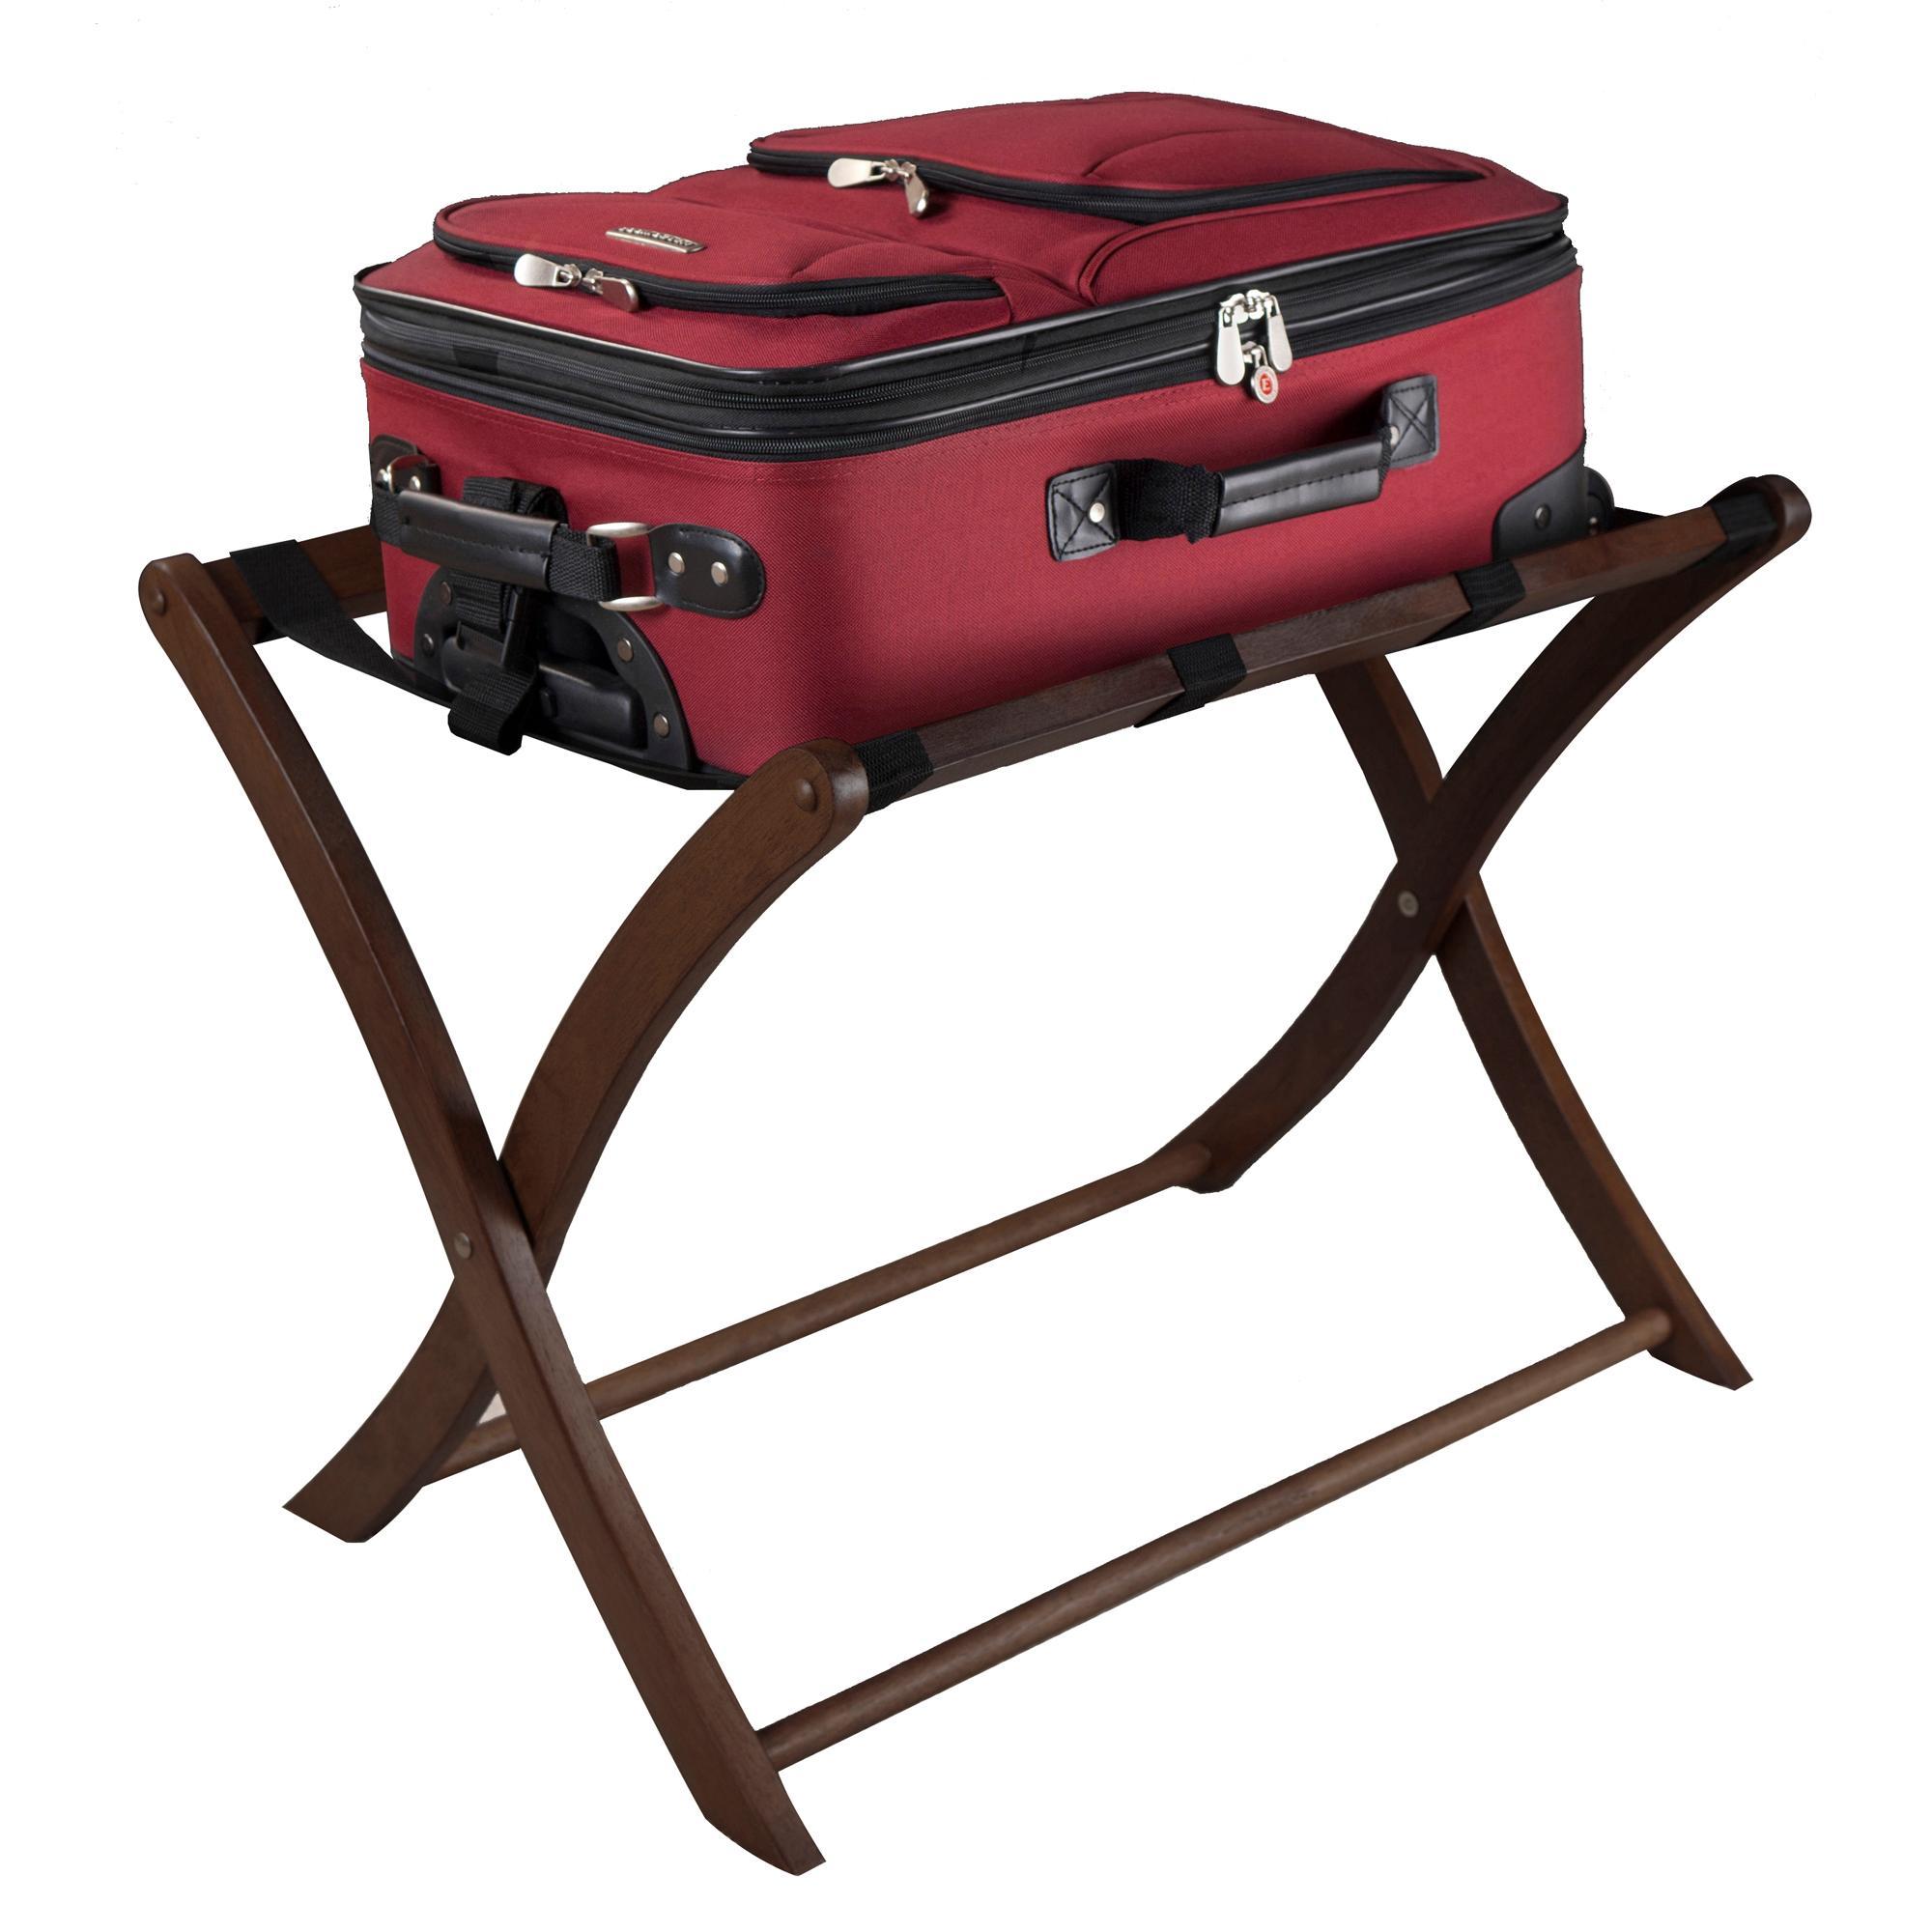 Amazon.com: Winsome Wood Luggage Rack, Walnut: Kitchen & Dining